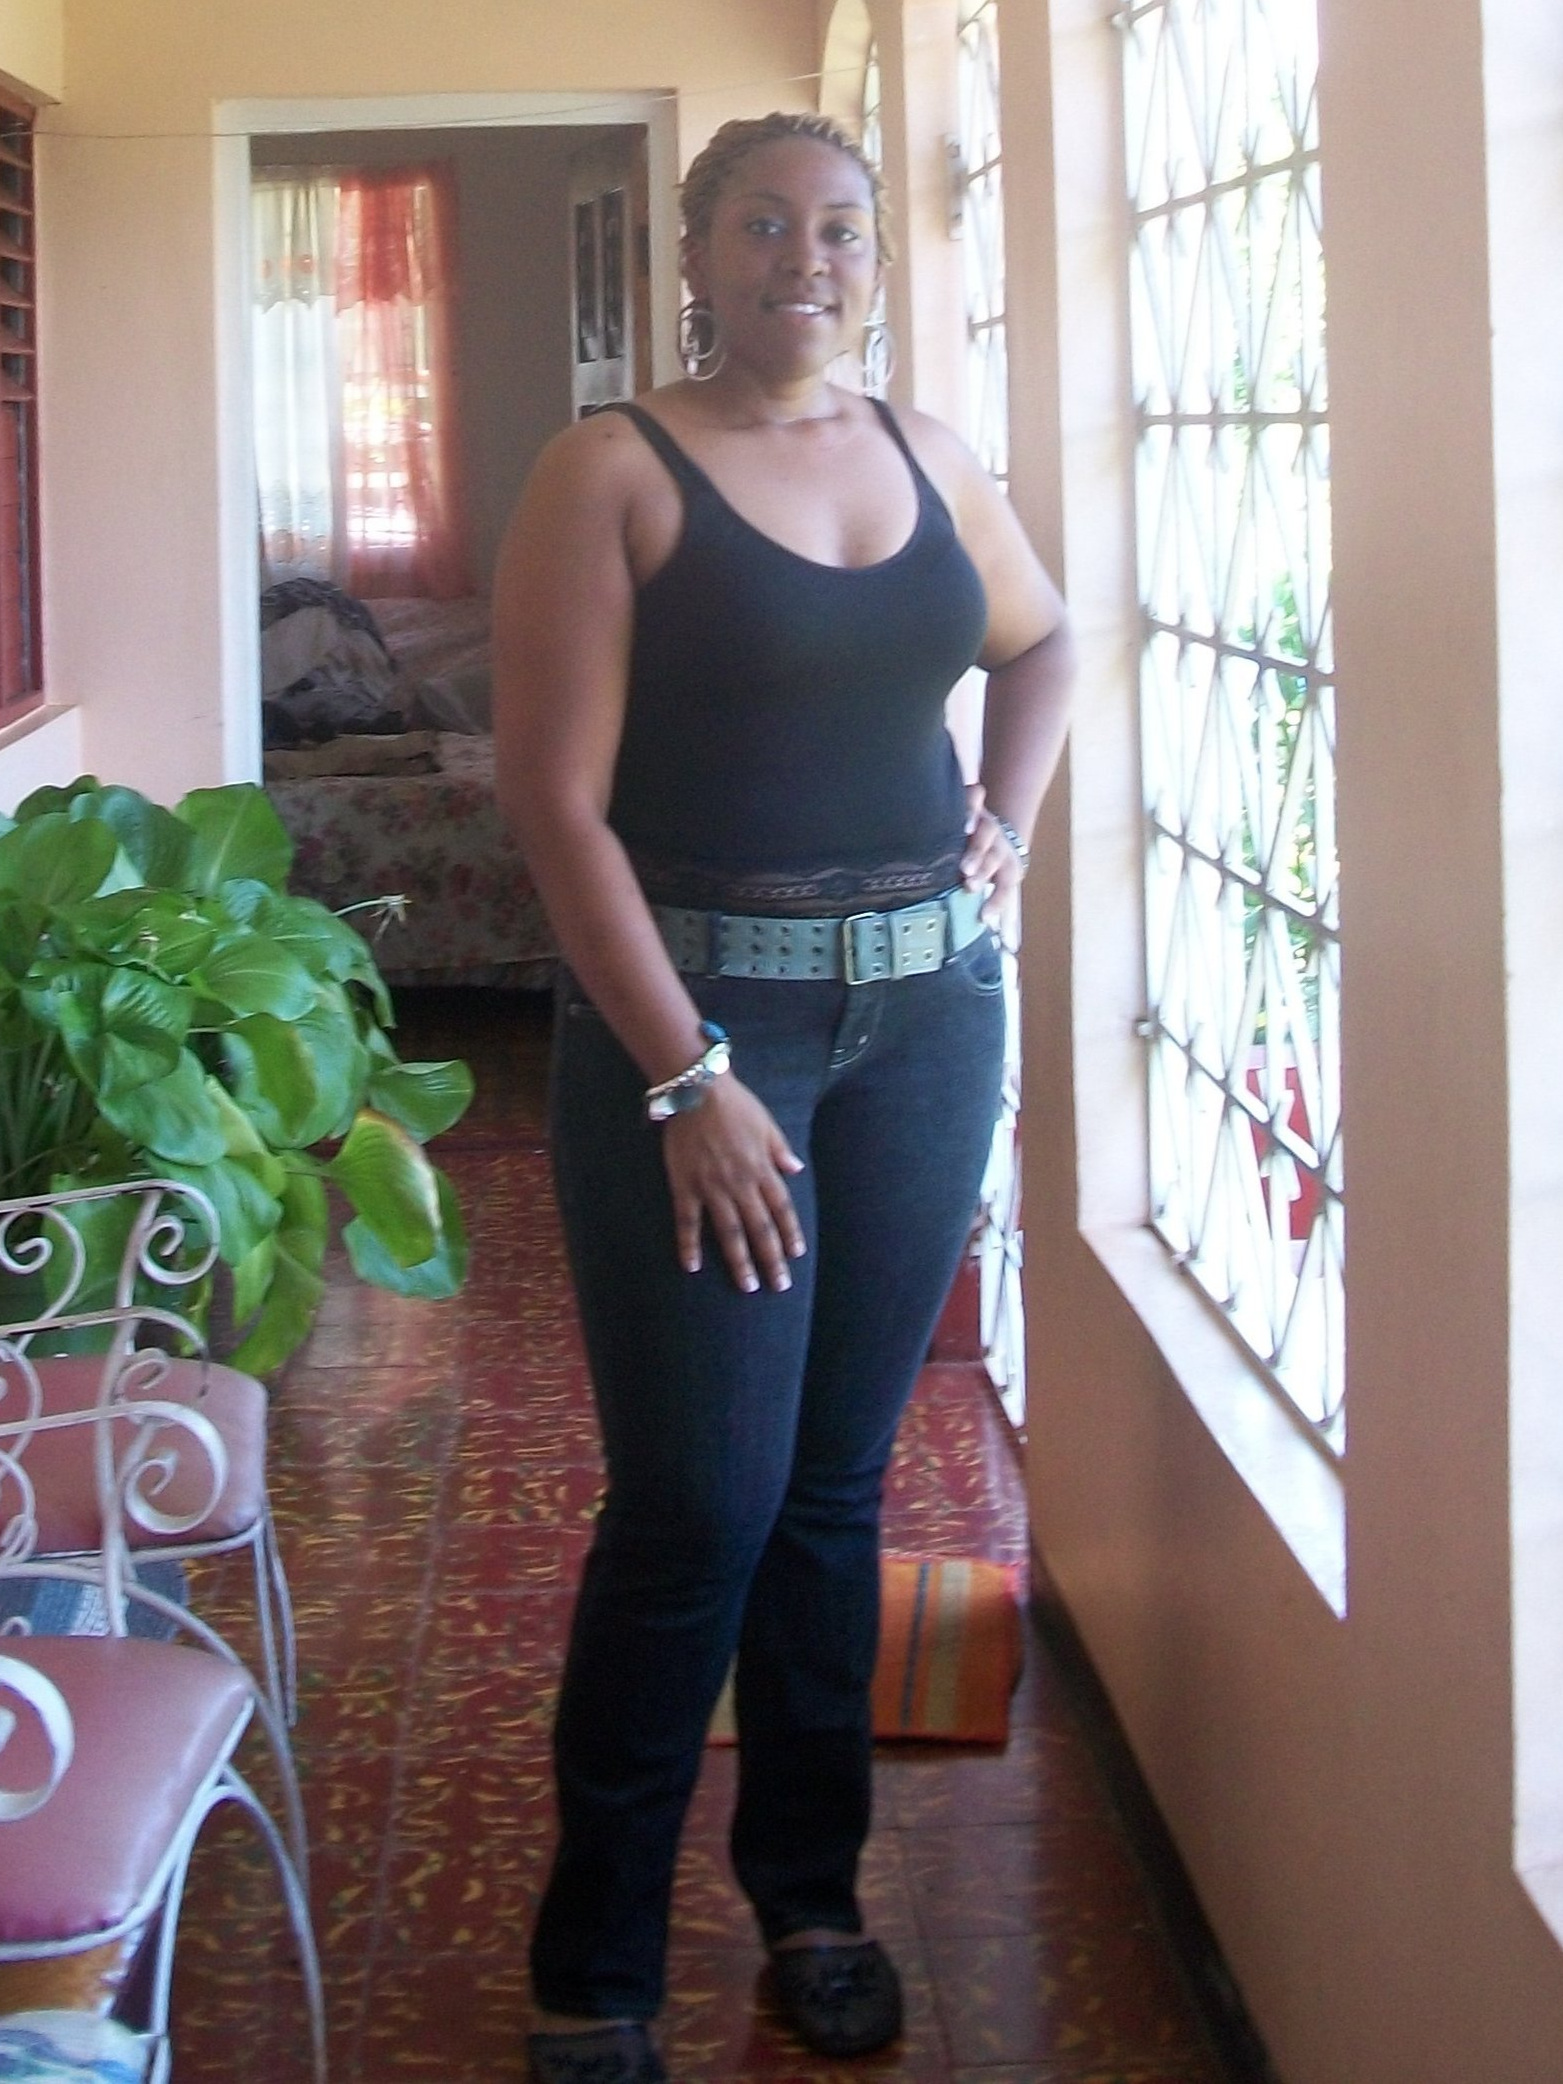 Alesha 6 months after my 1st 5k in Santa Cruz, ST. Elizabeth, Jamaica; September 2009